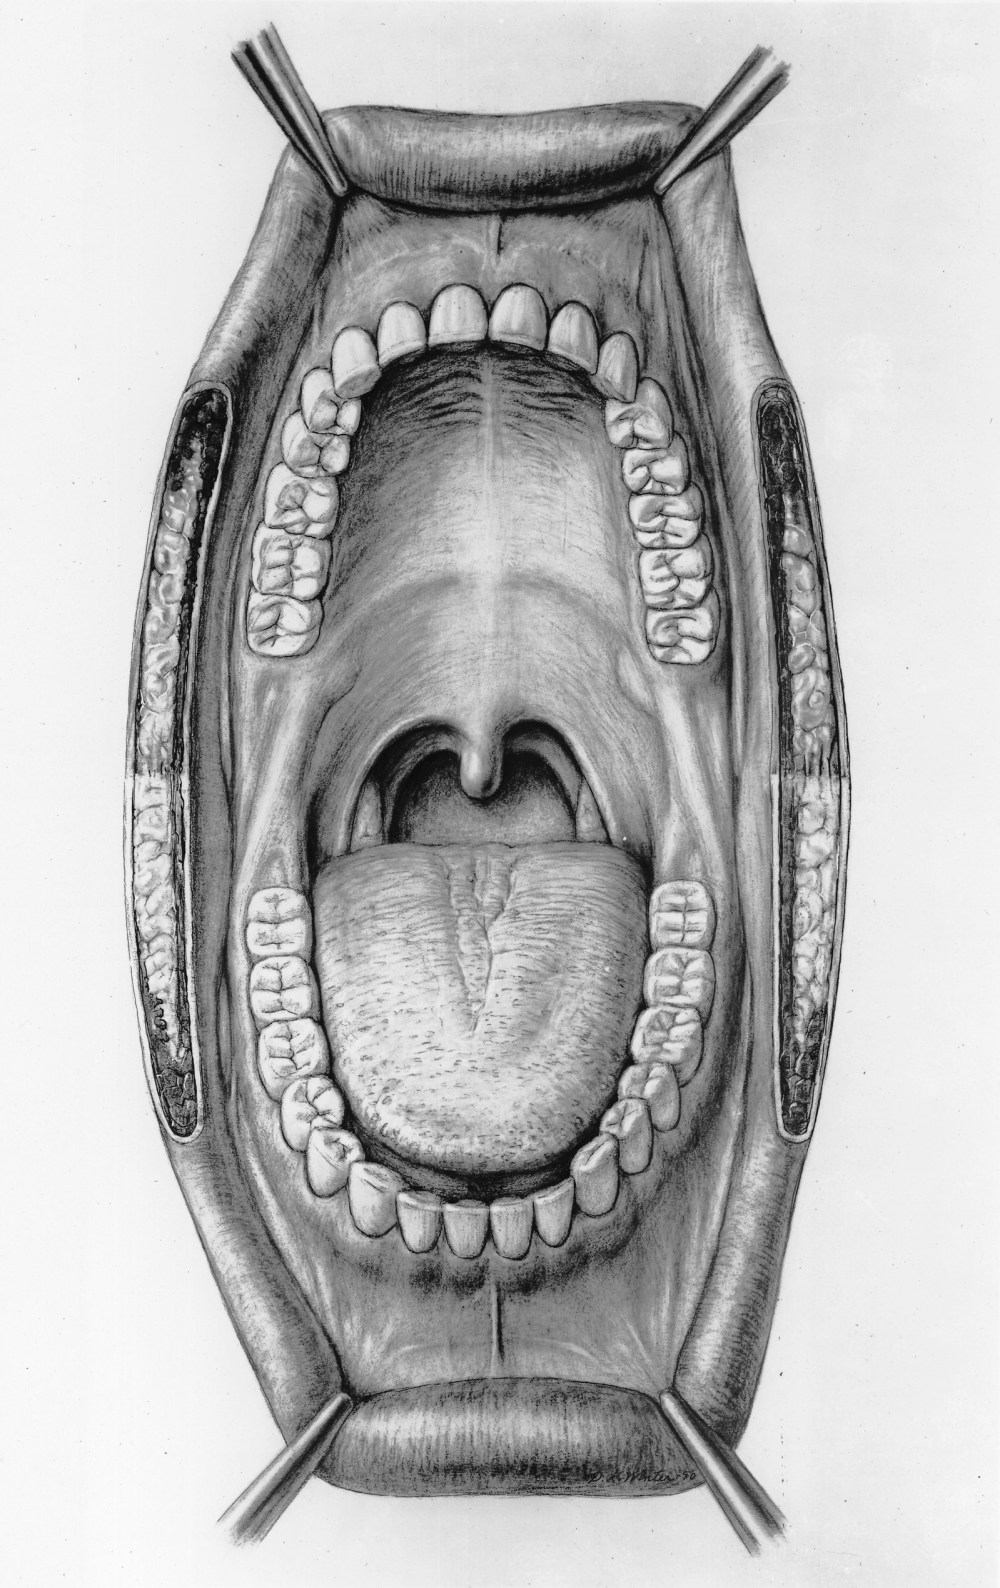 medium resolution of mouth illustration otis archives